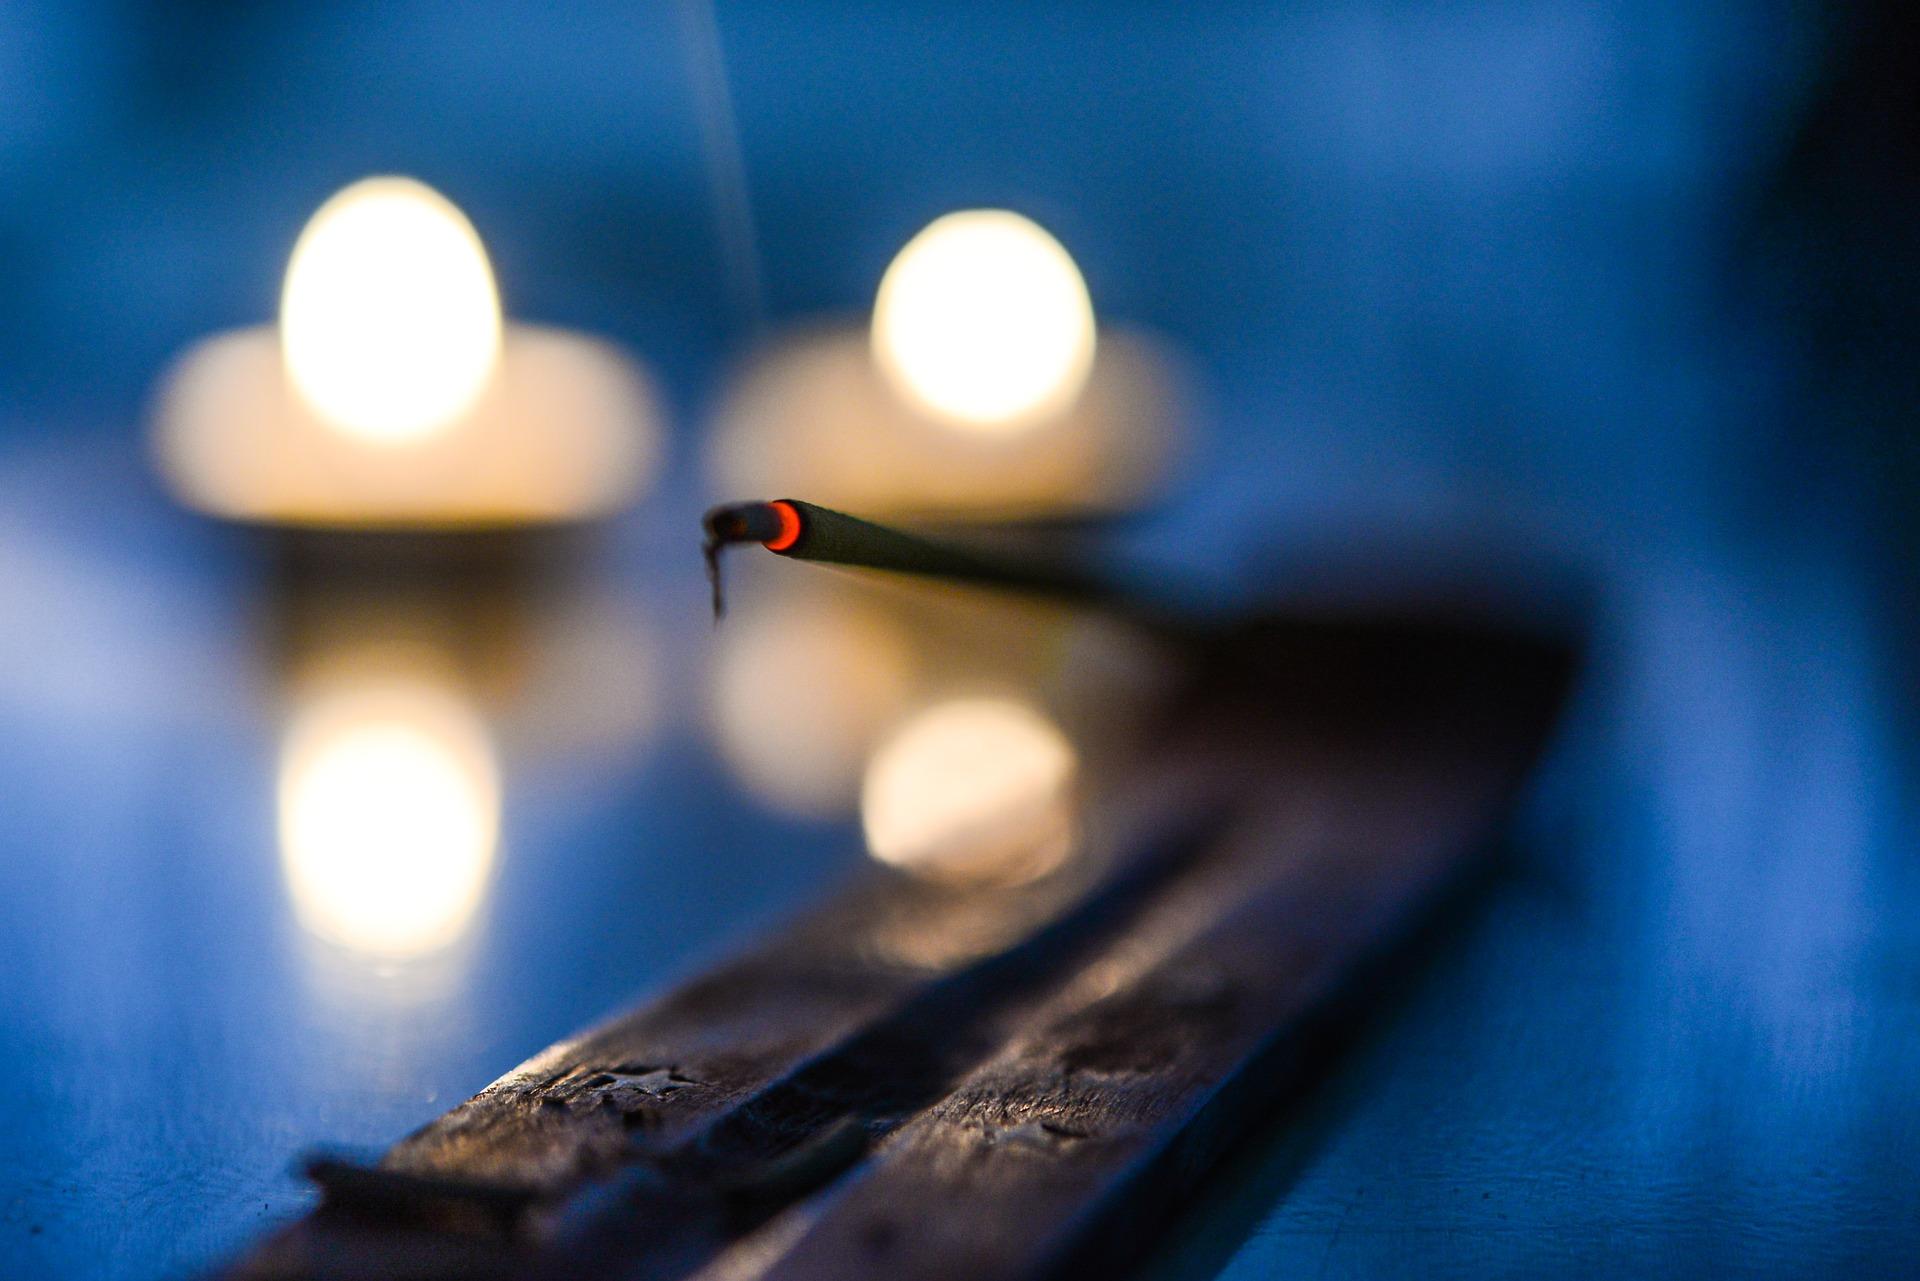 https://pixabay.com/photos/incense-glow-candle-burn-religion-2733035/